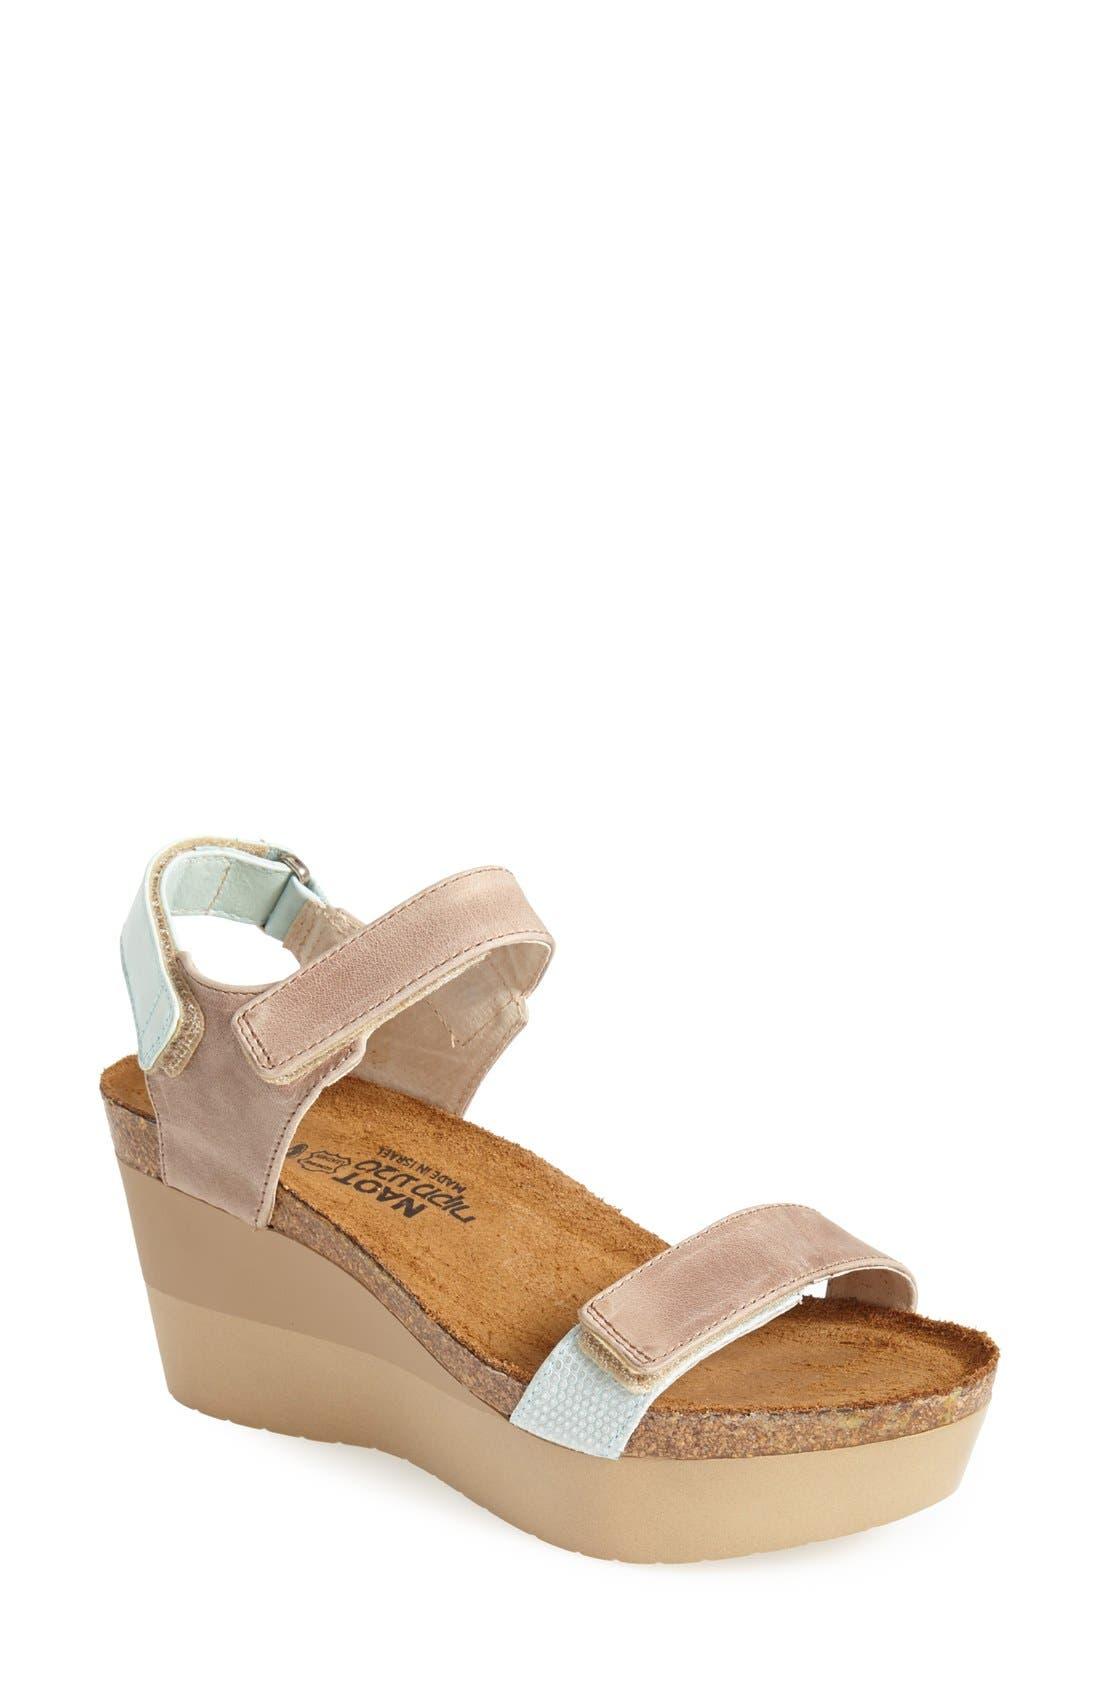 Naot 'Miracle' Sandal